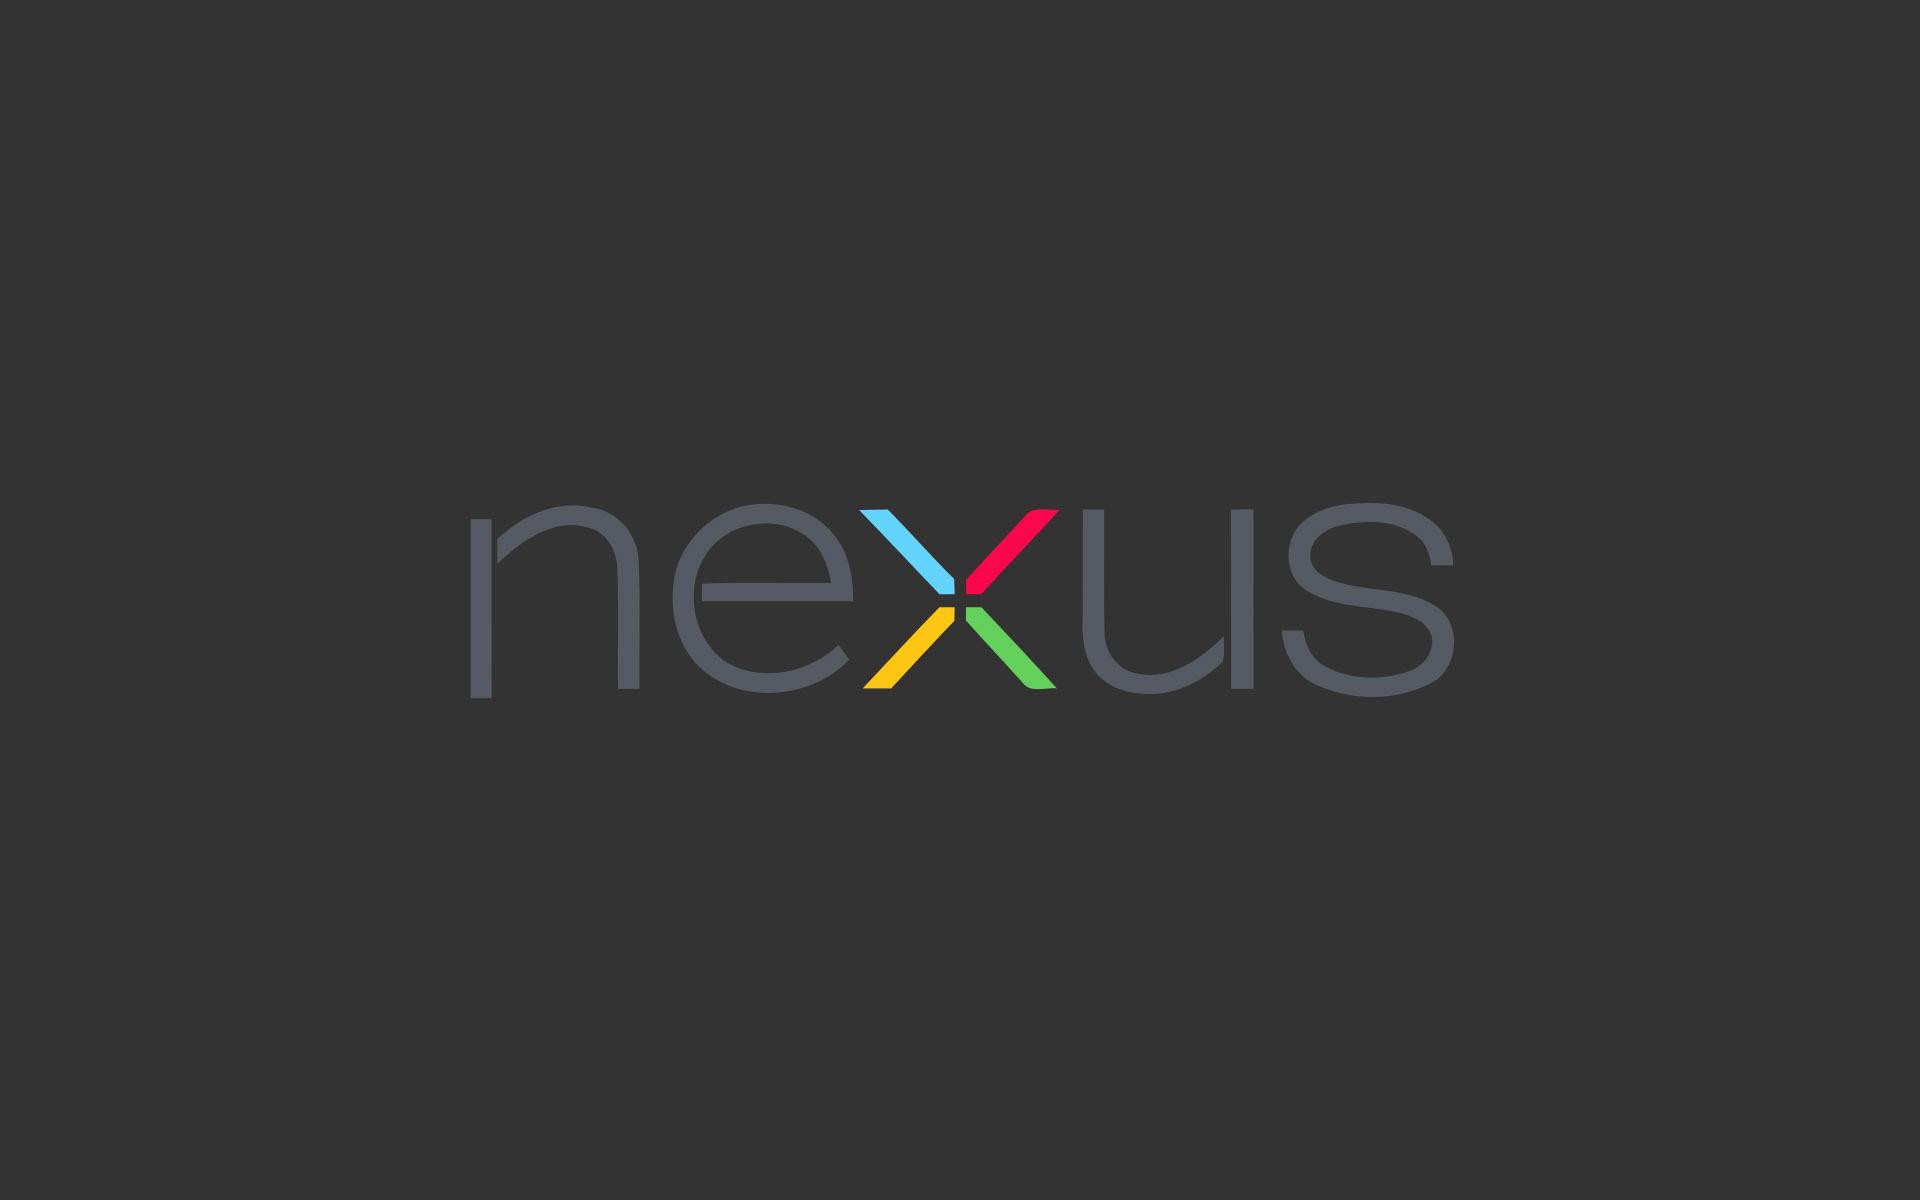 Google nexus tablet smartphone android texture wallpapers photos 1920x1200